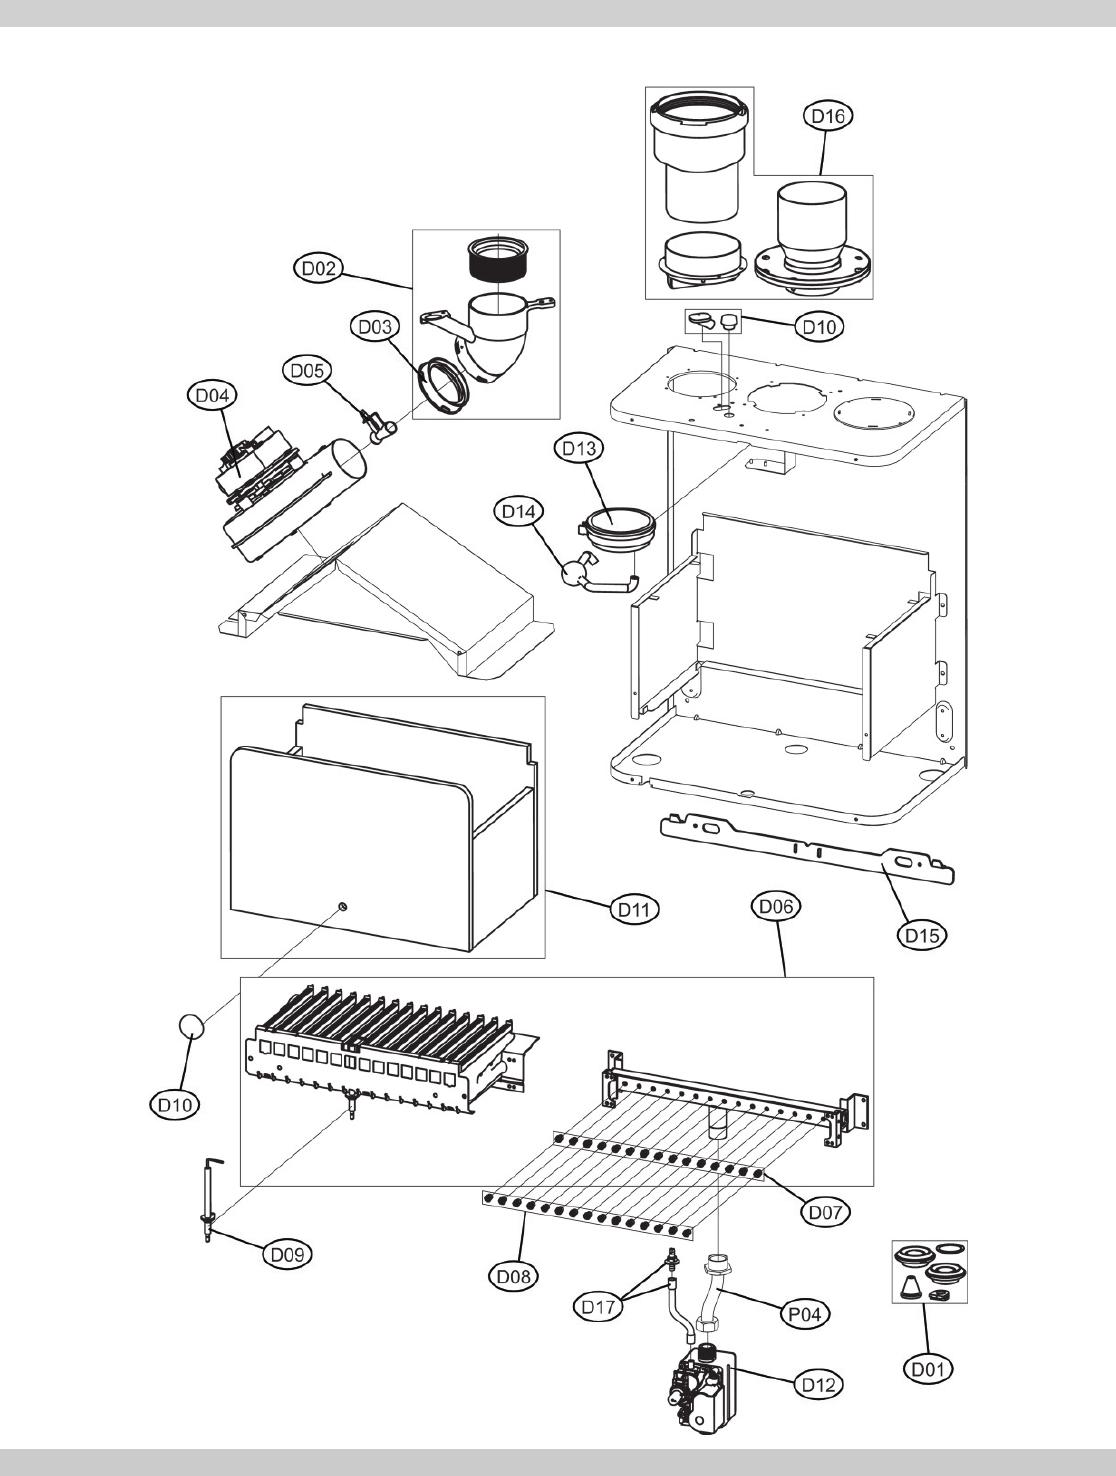 Boiler Hot Water Heater Wiring Diagram Diagrams Boilers And Manuals Utica Cub Series Operation Installation Manual 3541f240 Chb